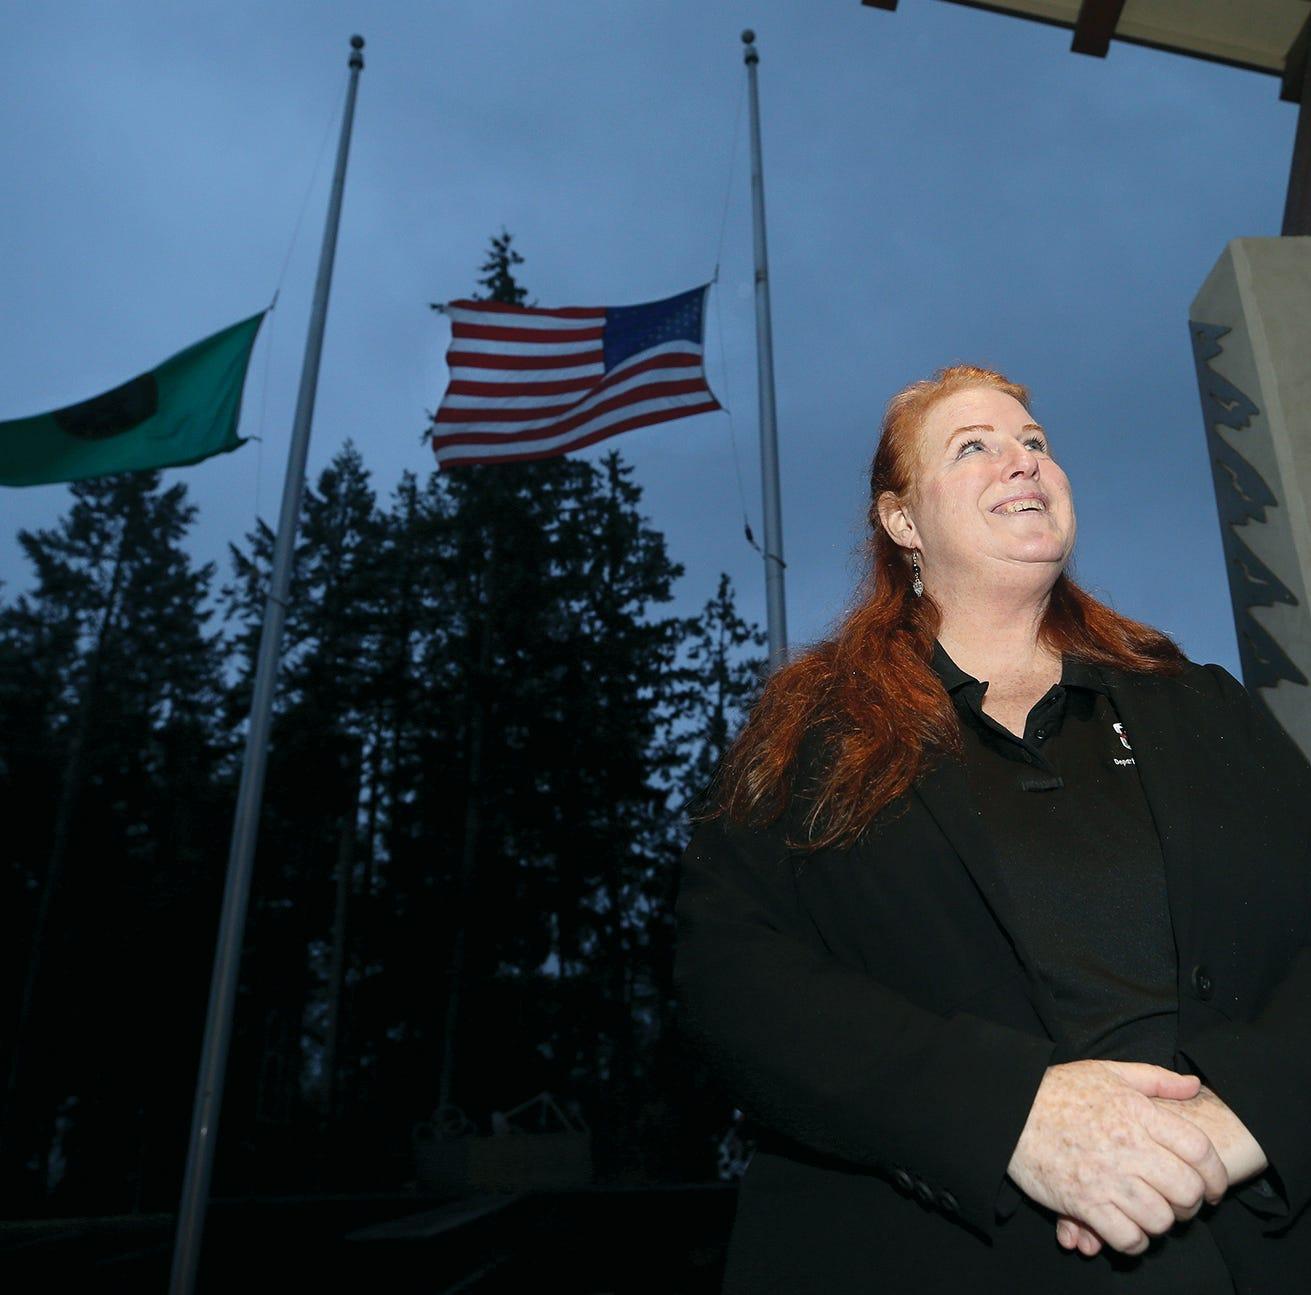 Kitsap's new emergency director helped deadly Amtrak crash response